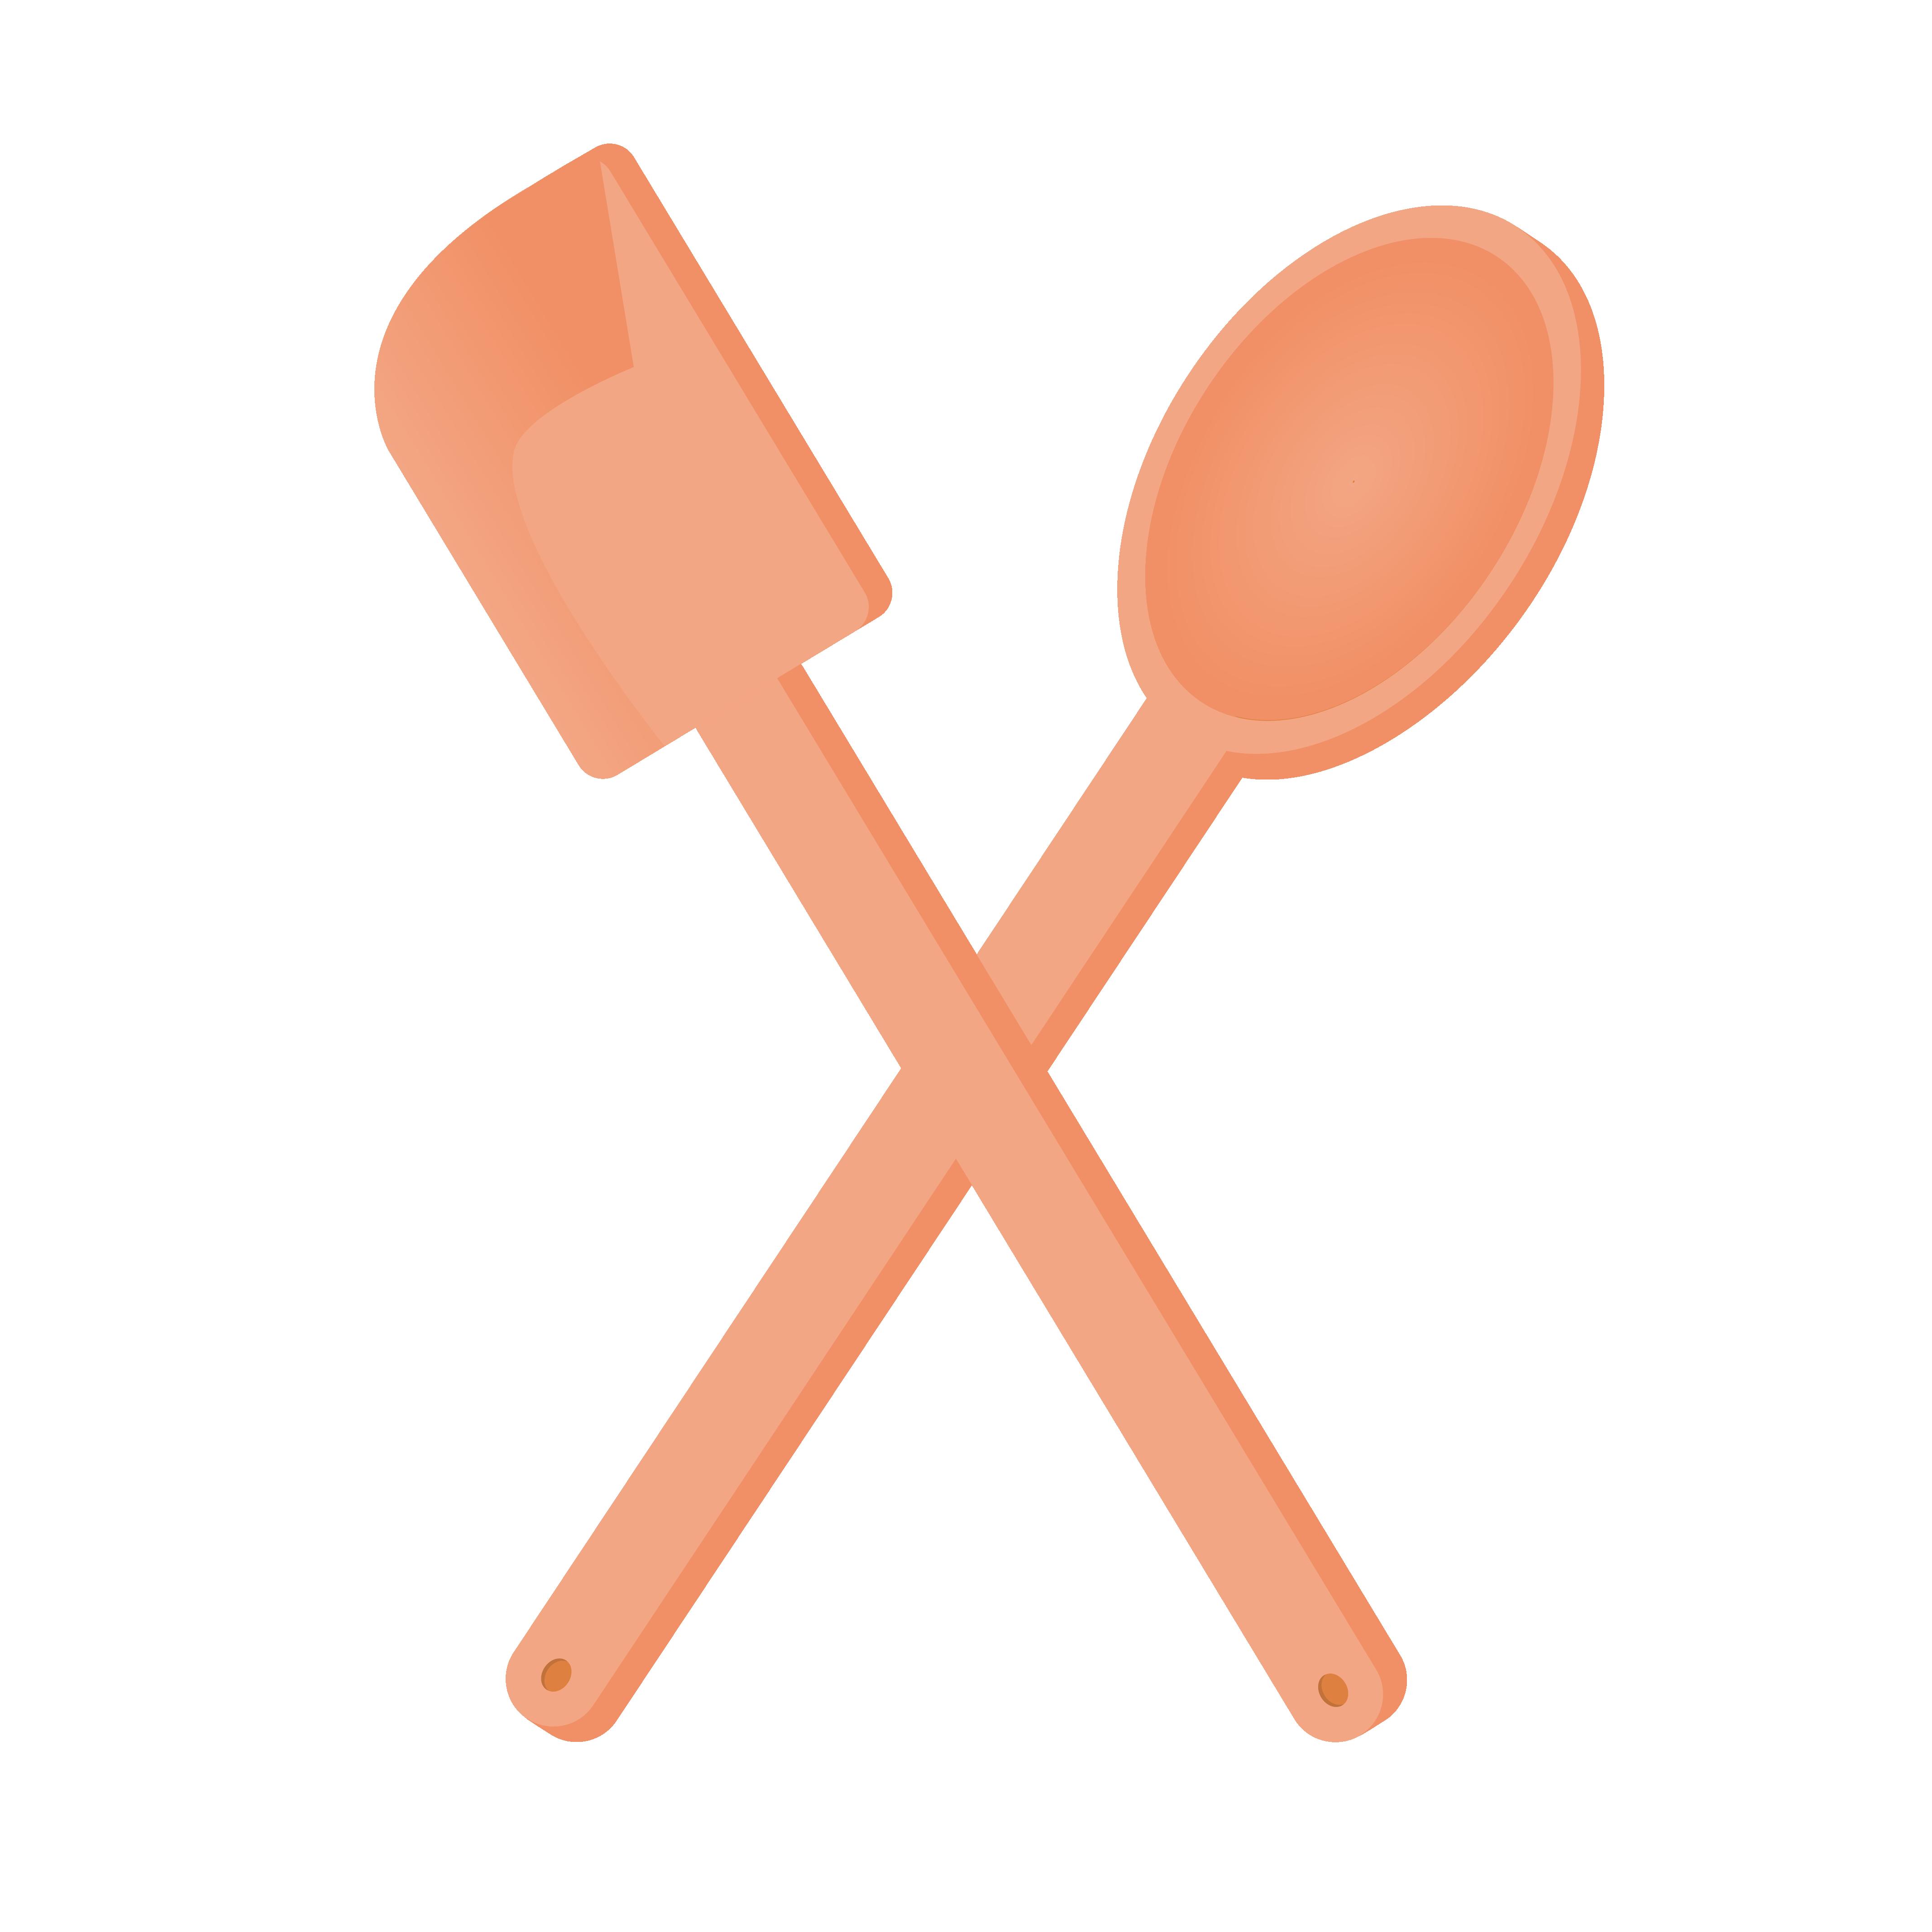 Spoon 03